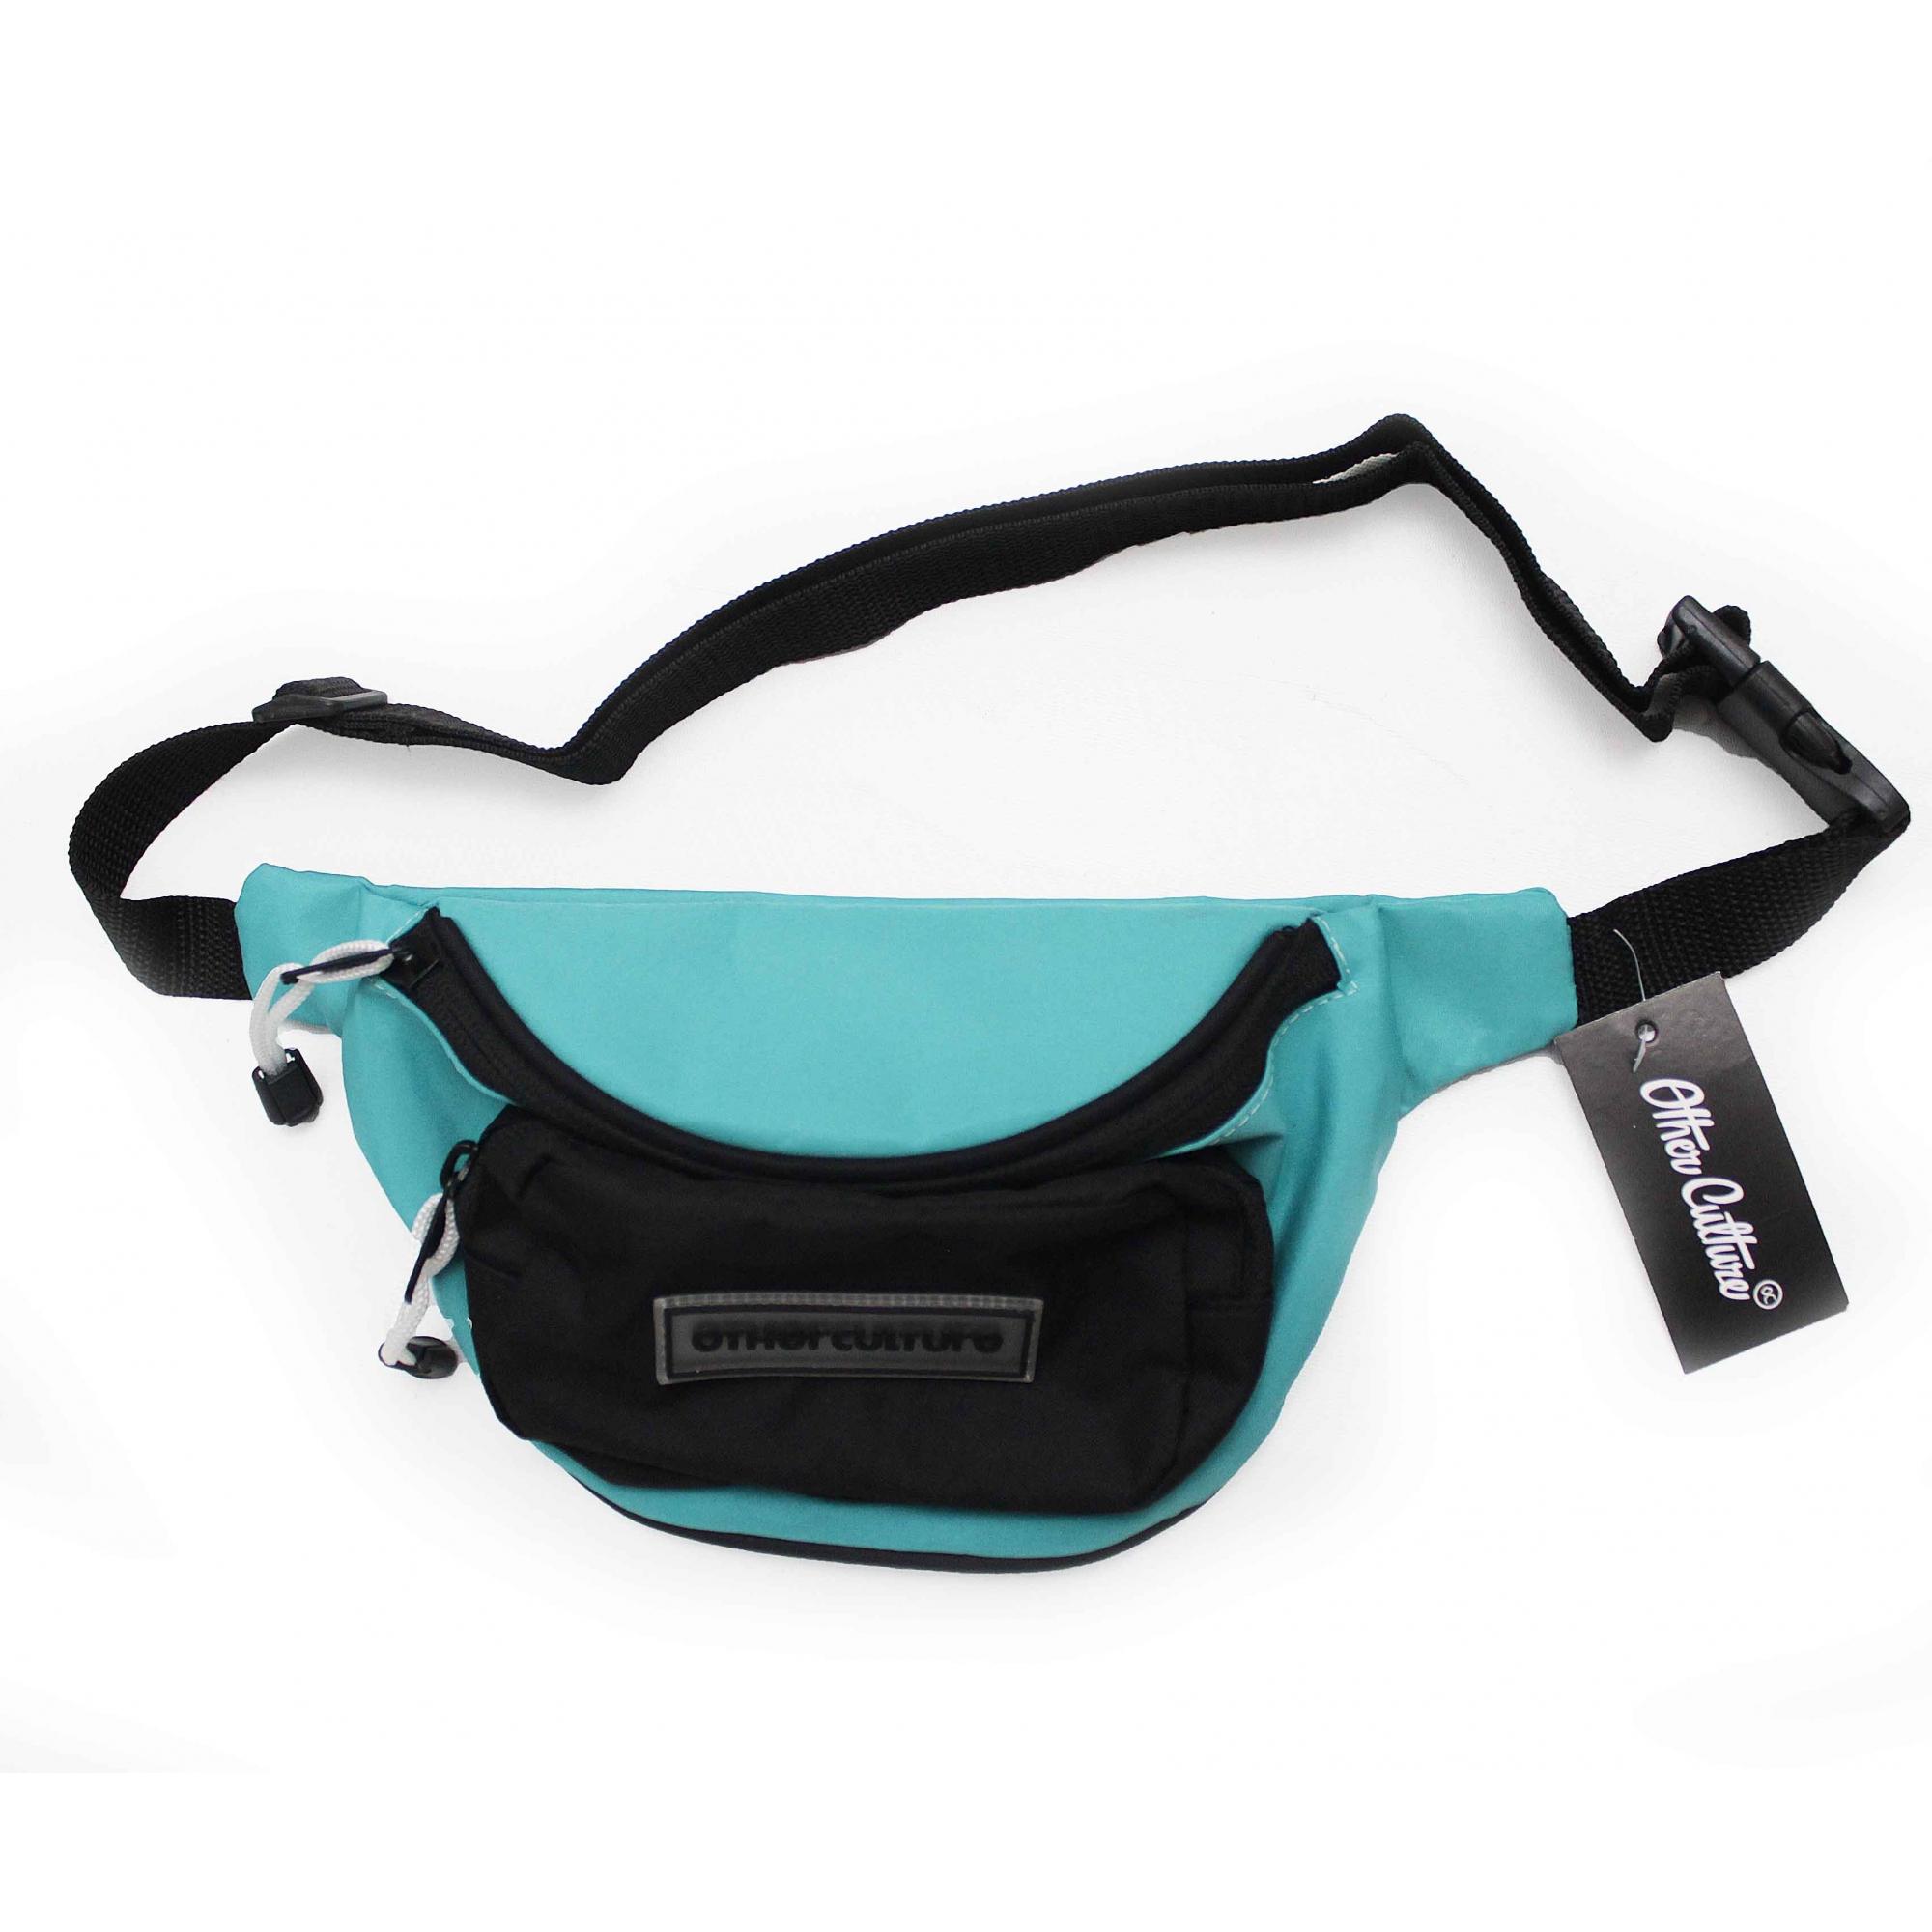 Pochete Other Culture Sport Tiffany - Azul